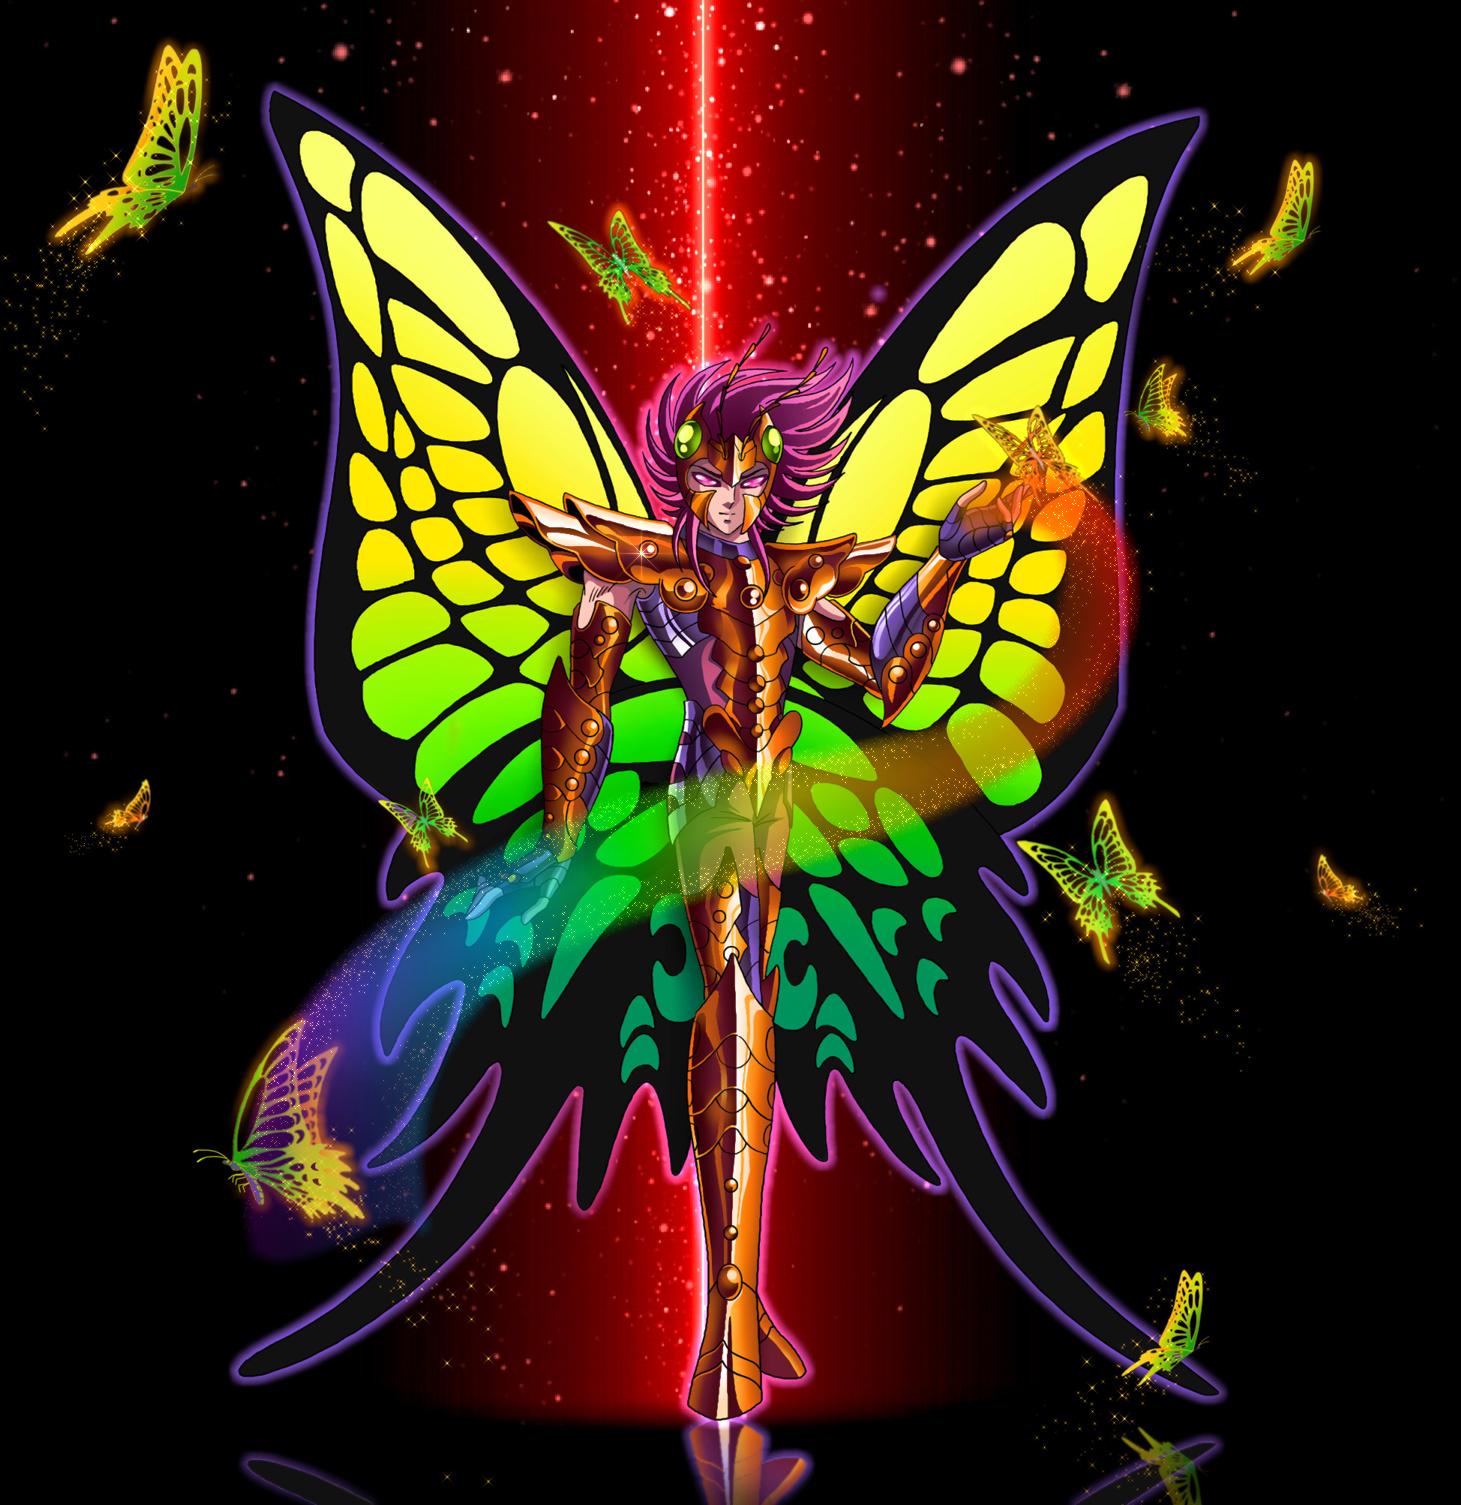 saint seiya hades papillon myu by juni anker - Image De Papillon